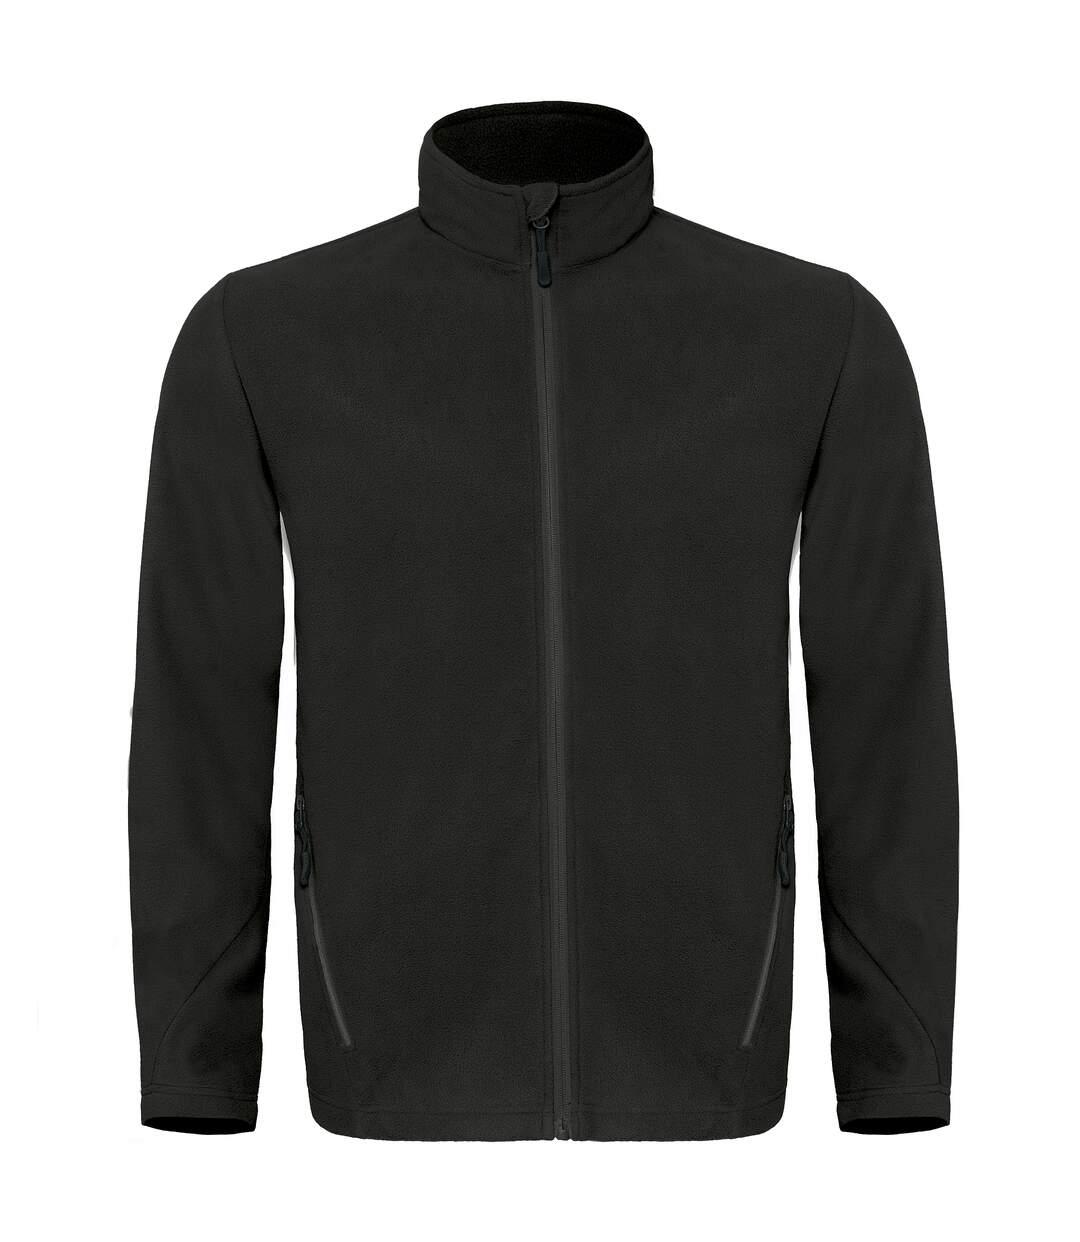 B&C Mens Coolstar Ultra Light Full Zip Fleece Top (Black) - UTRW3033